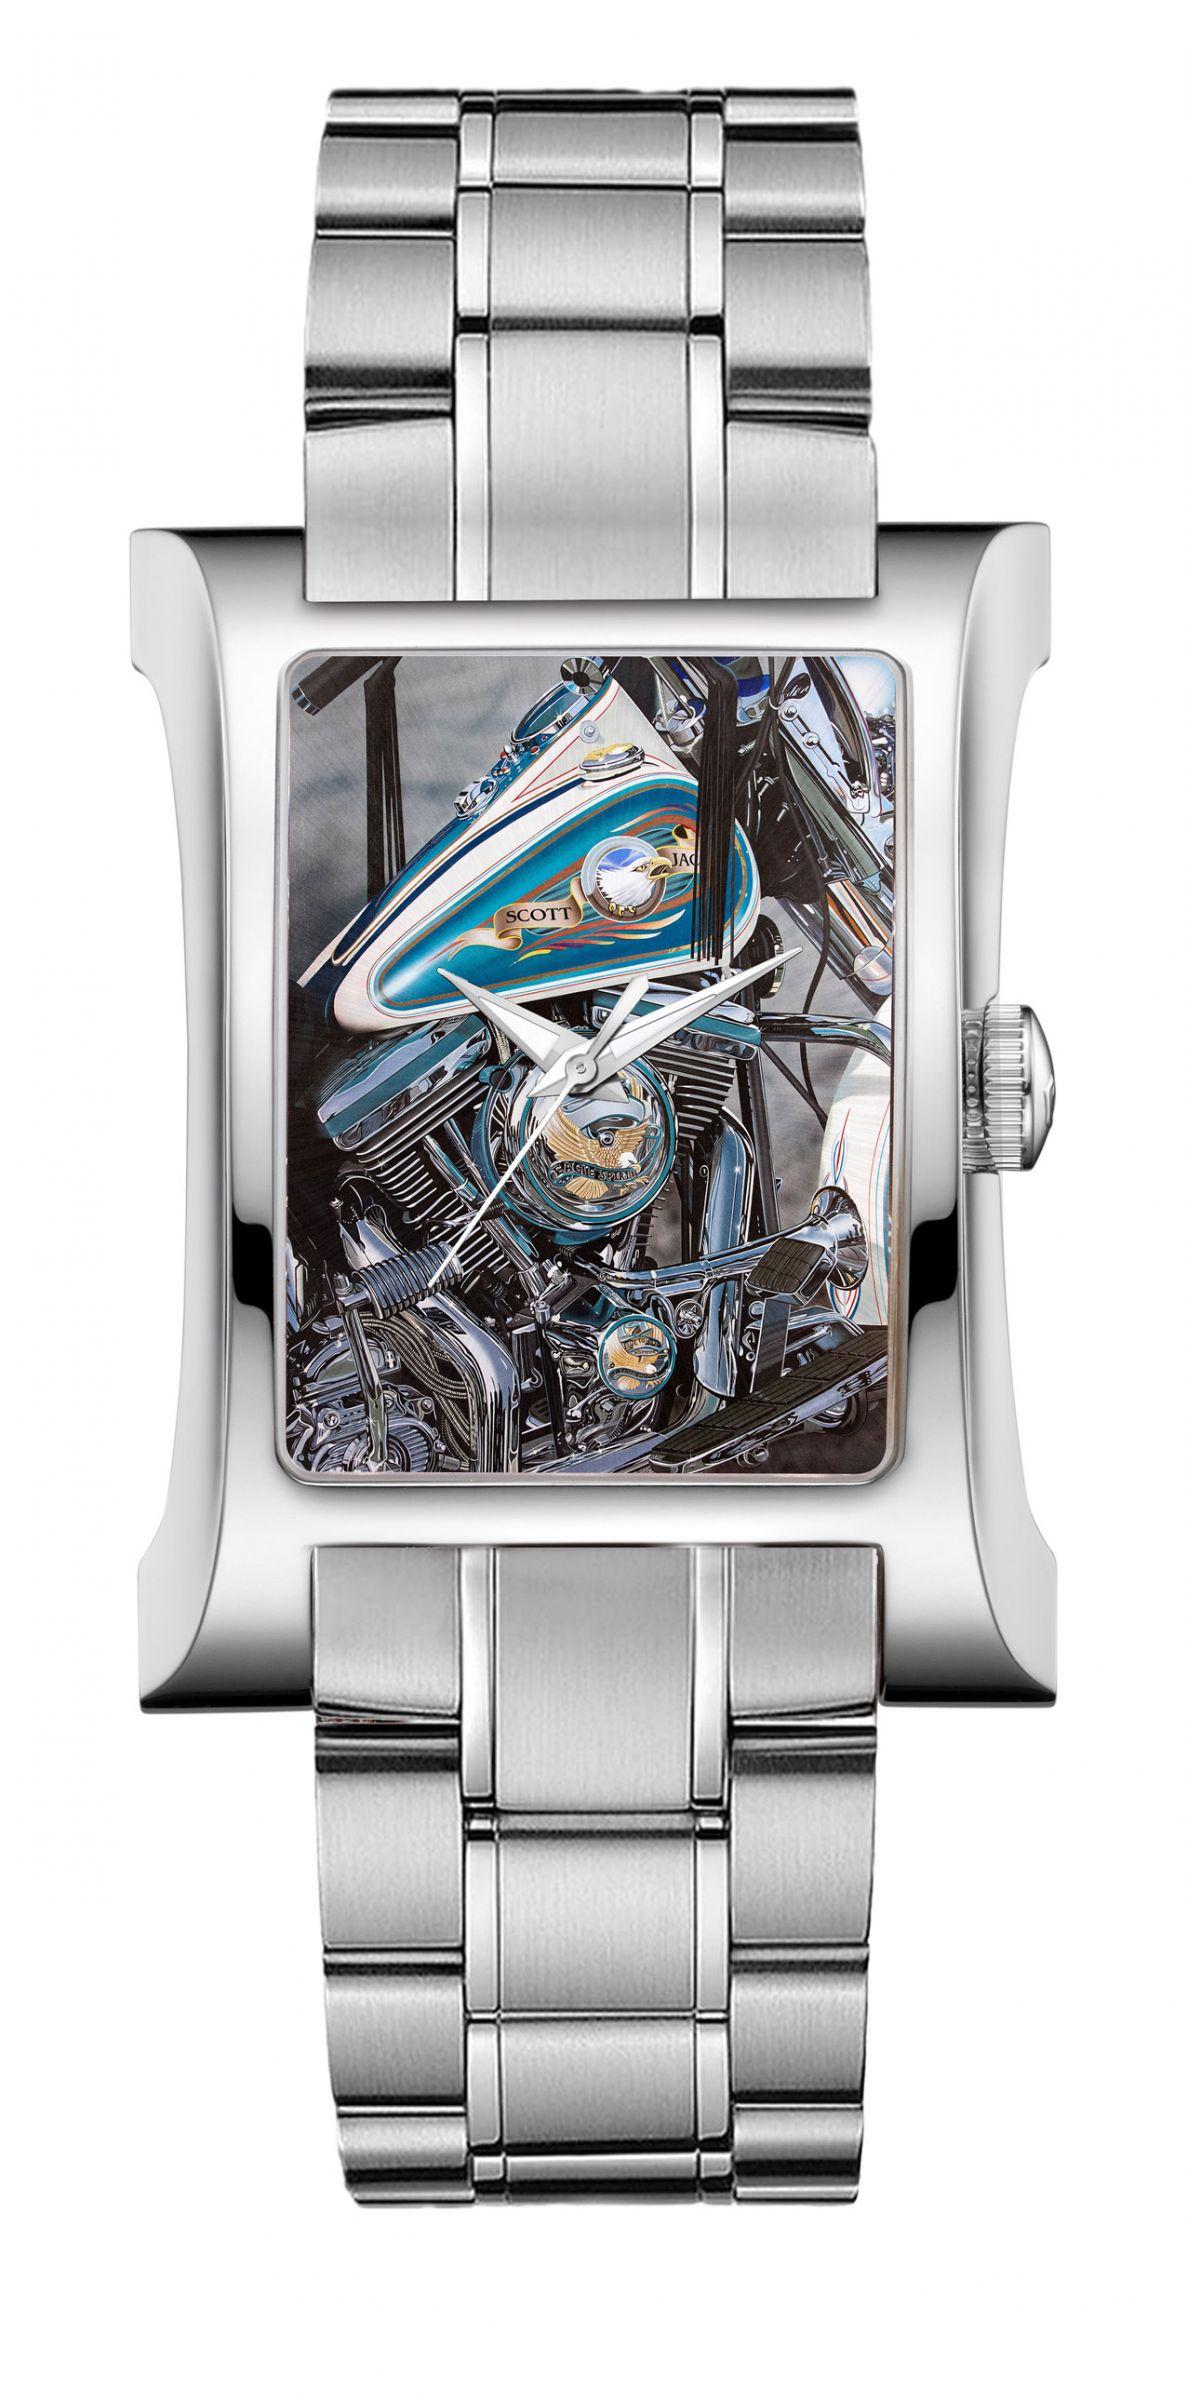 Cuervo y Sobrinos 'Live to Ride' timepiece.